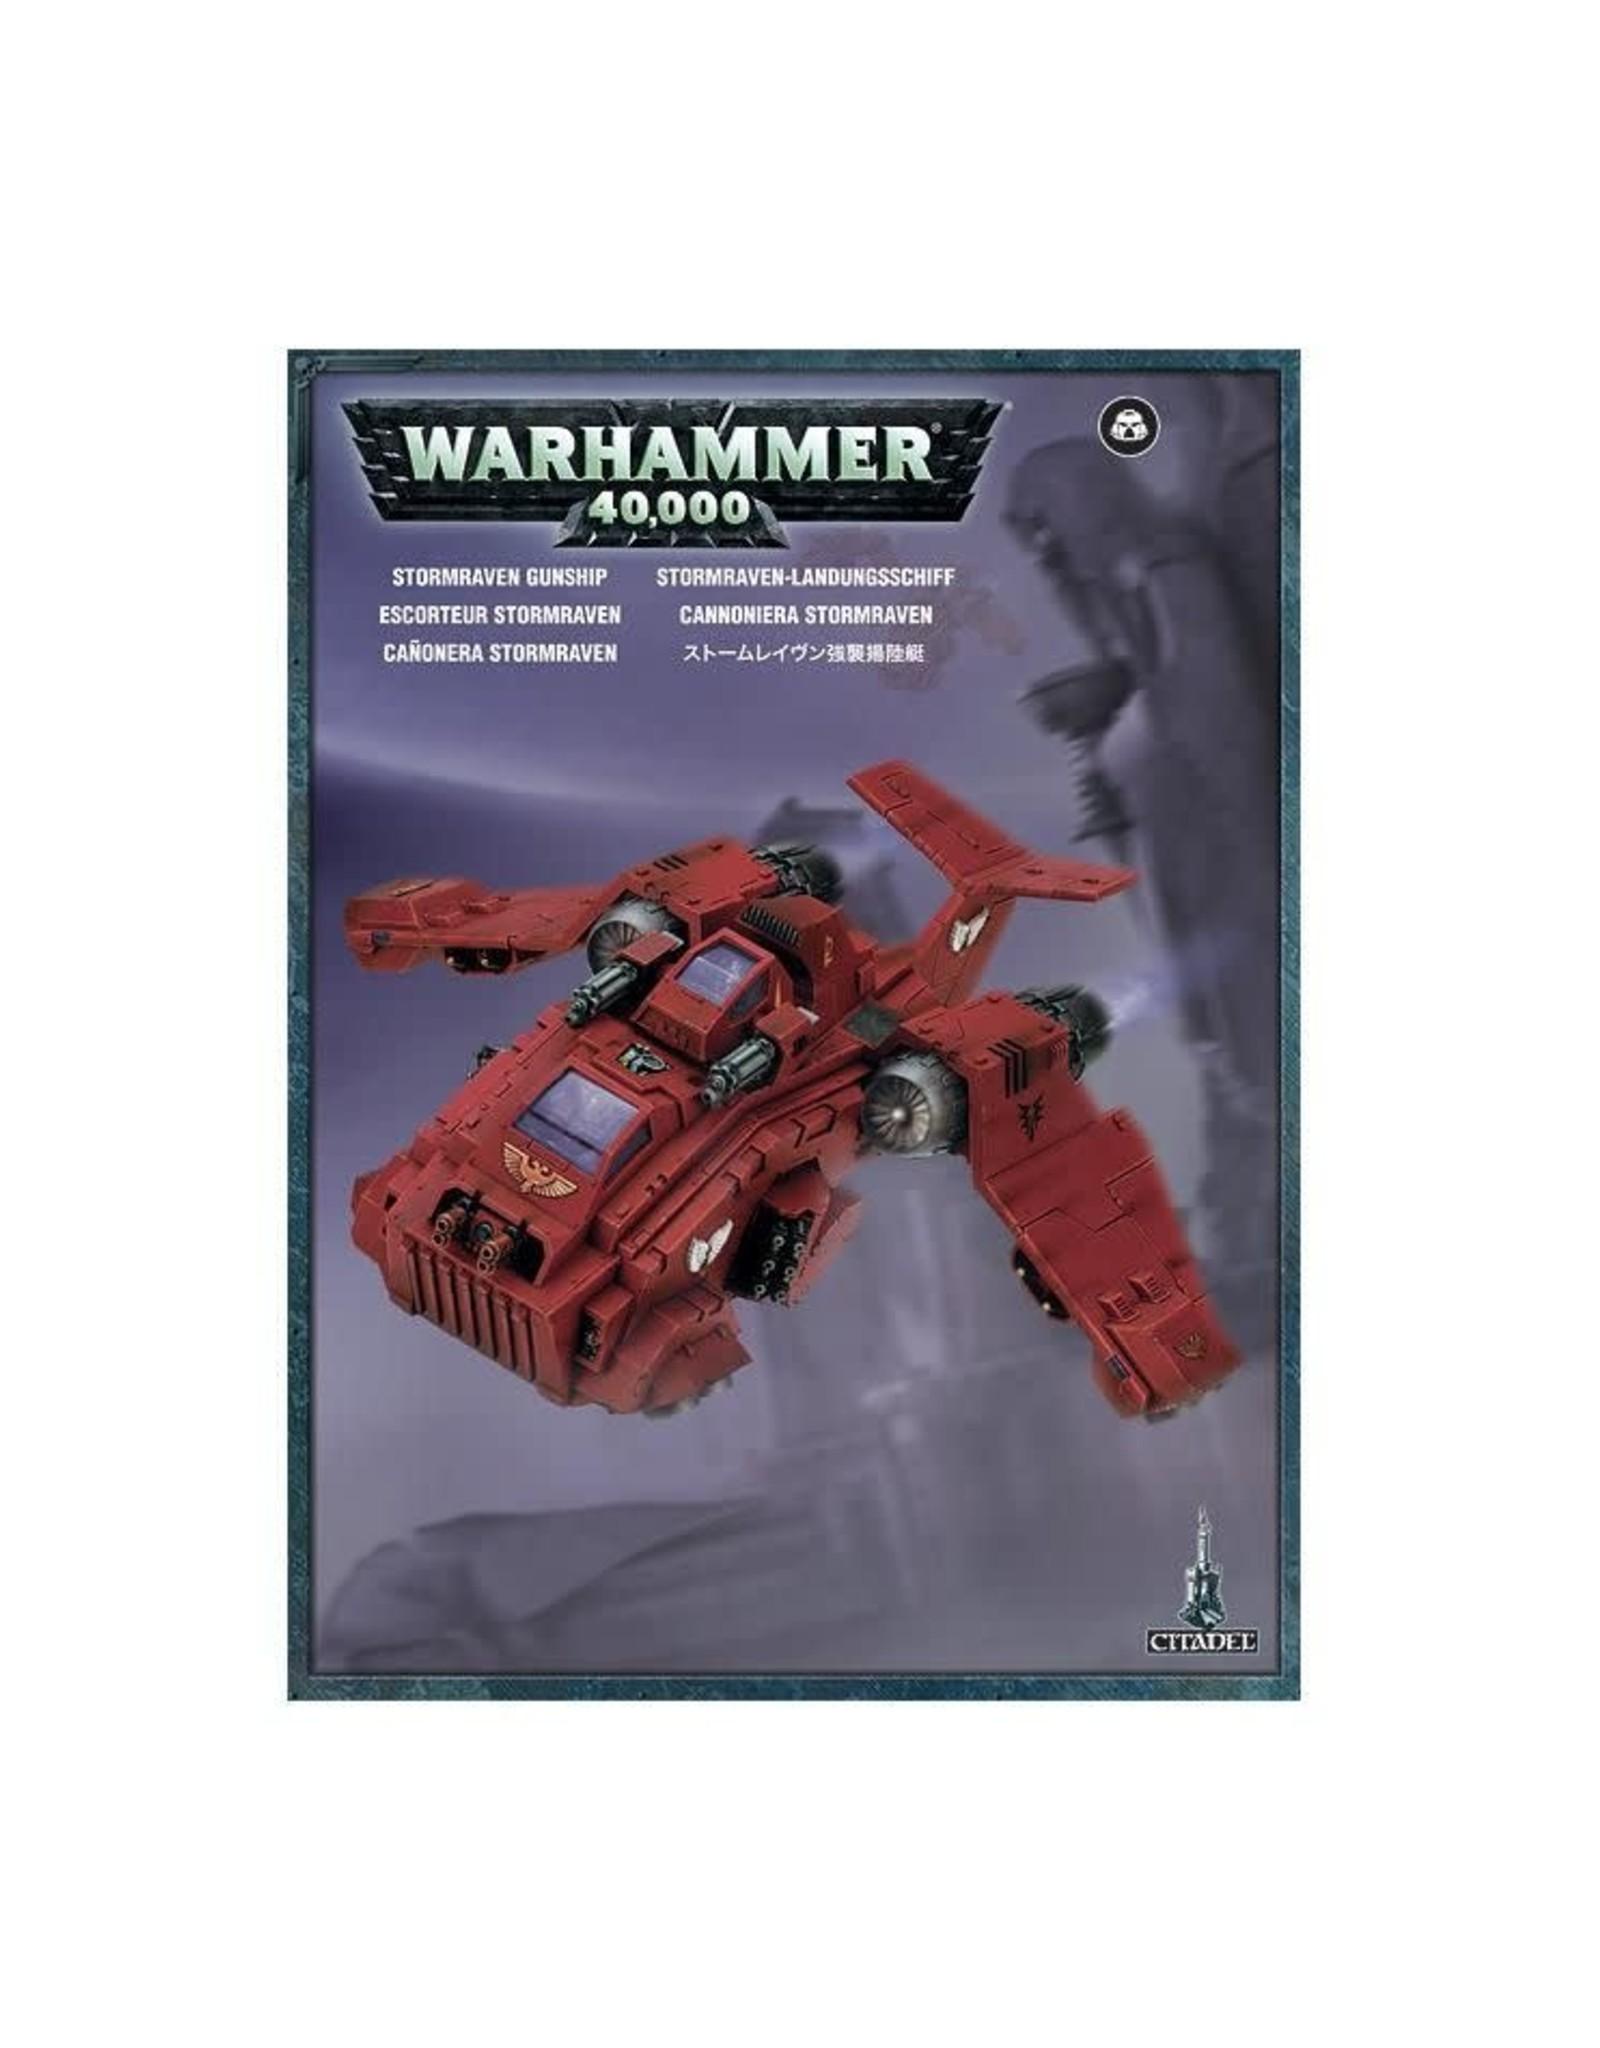 Warhammer 40K Stormraven Gunship